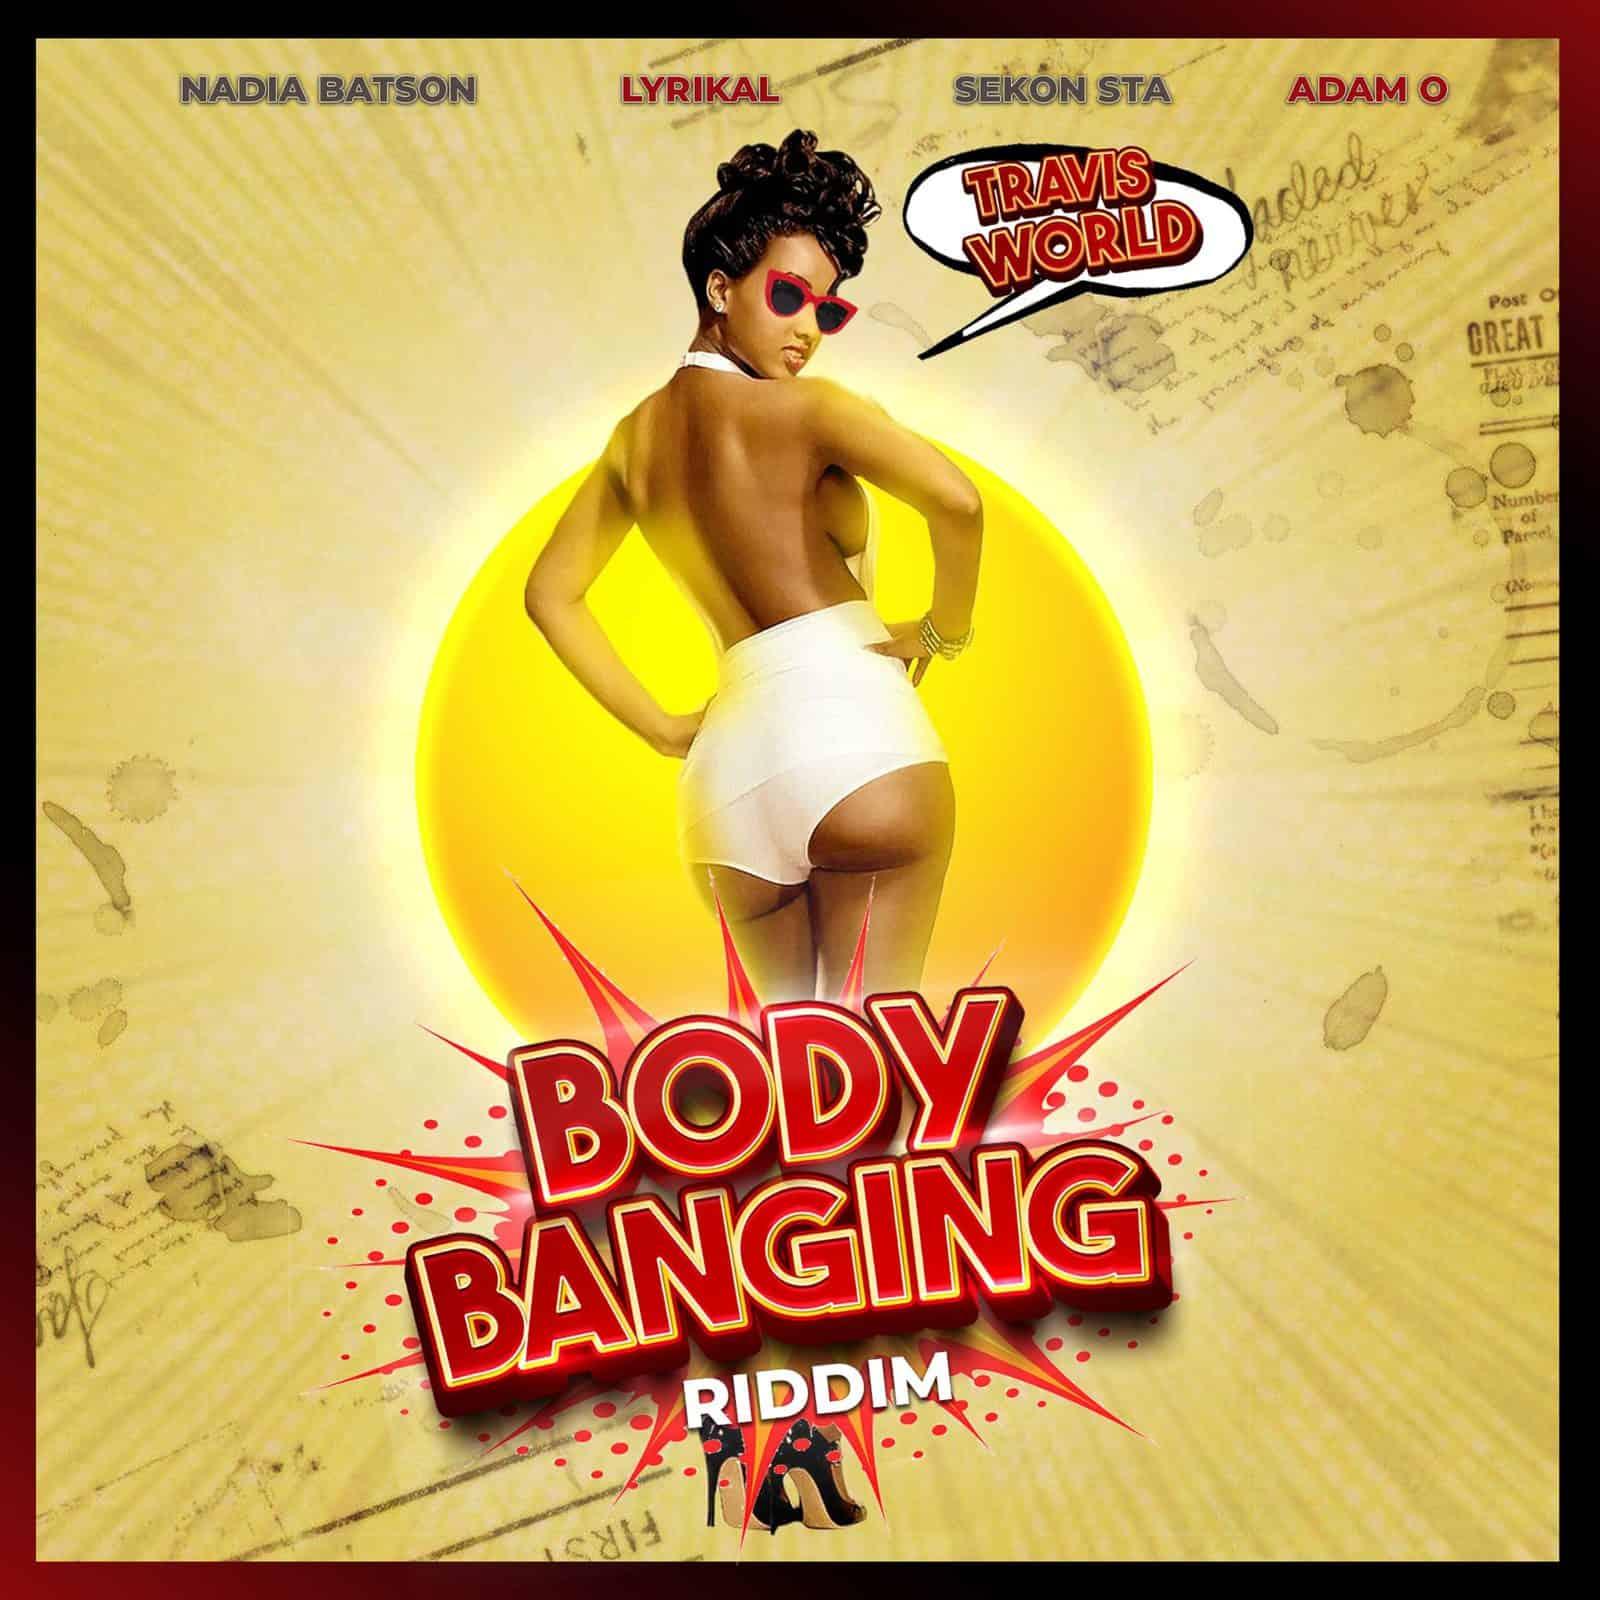 Travis World presents the Body Banging Riddim